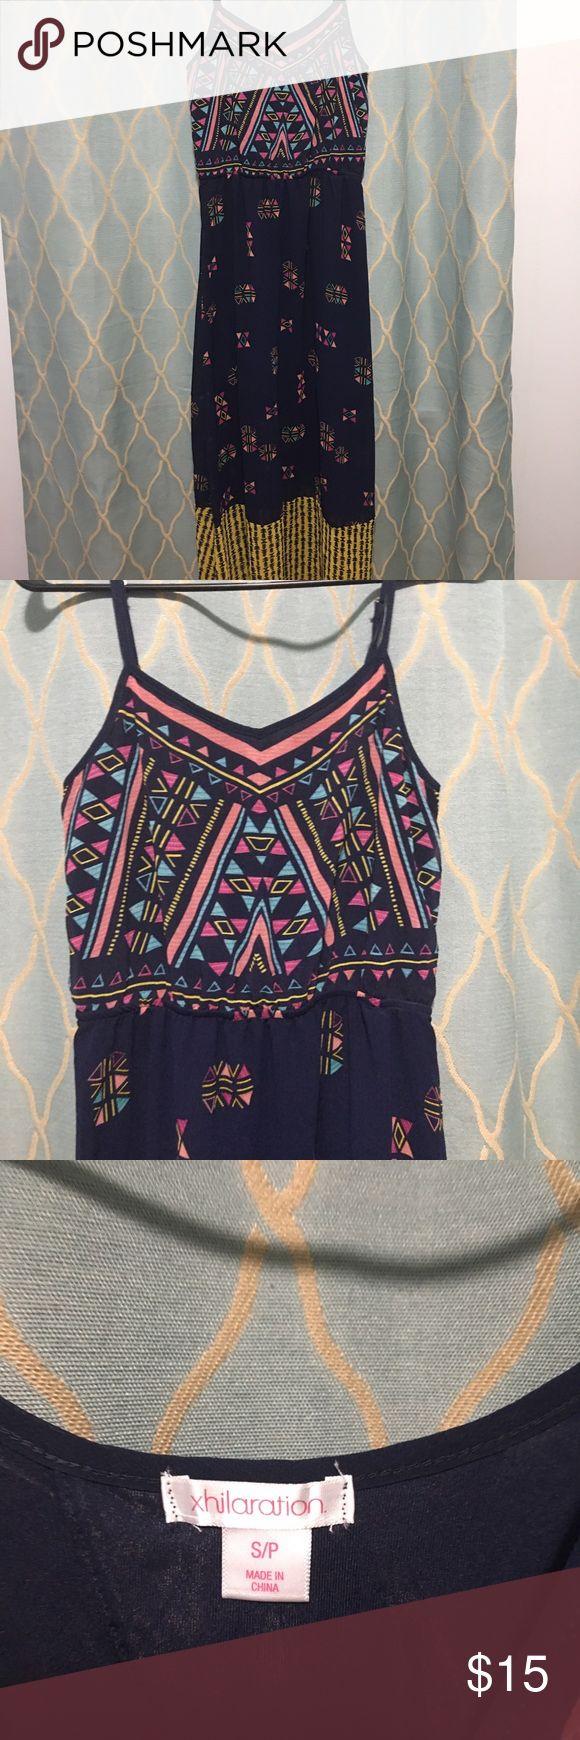 Tribal maxi dress with keyhole back Xhilaration navy maxi with tribal patterns Xhilaration Dresses Maxi